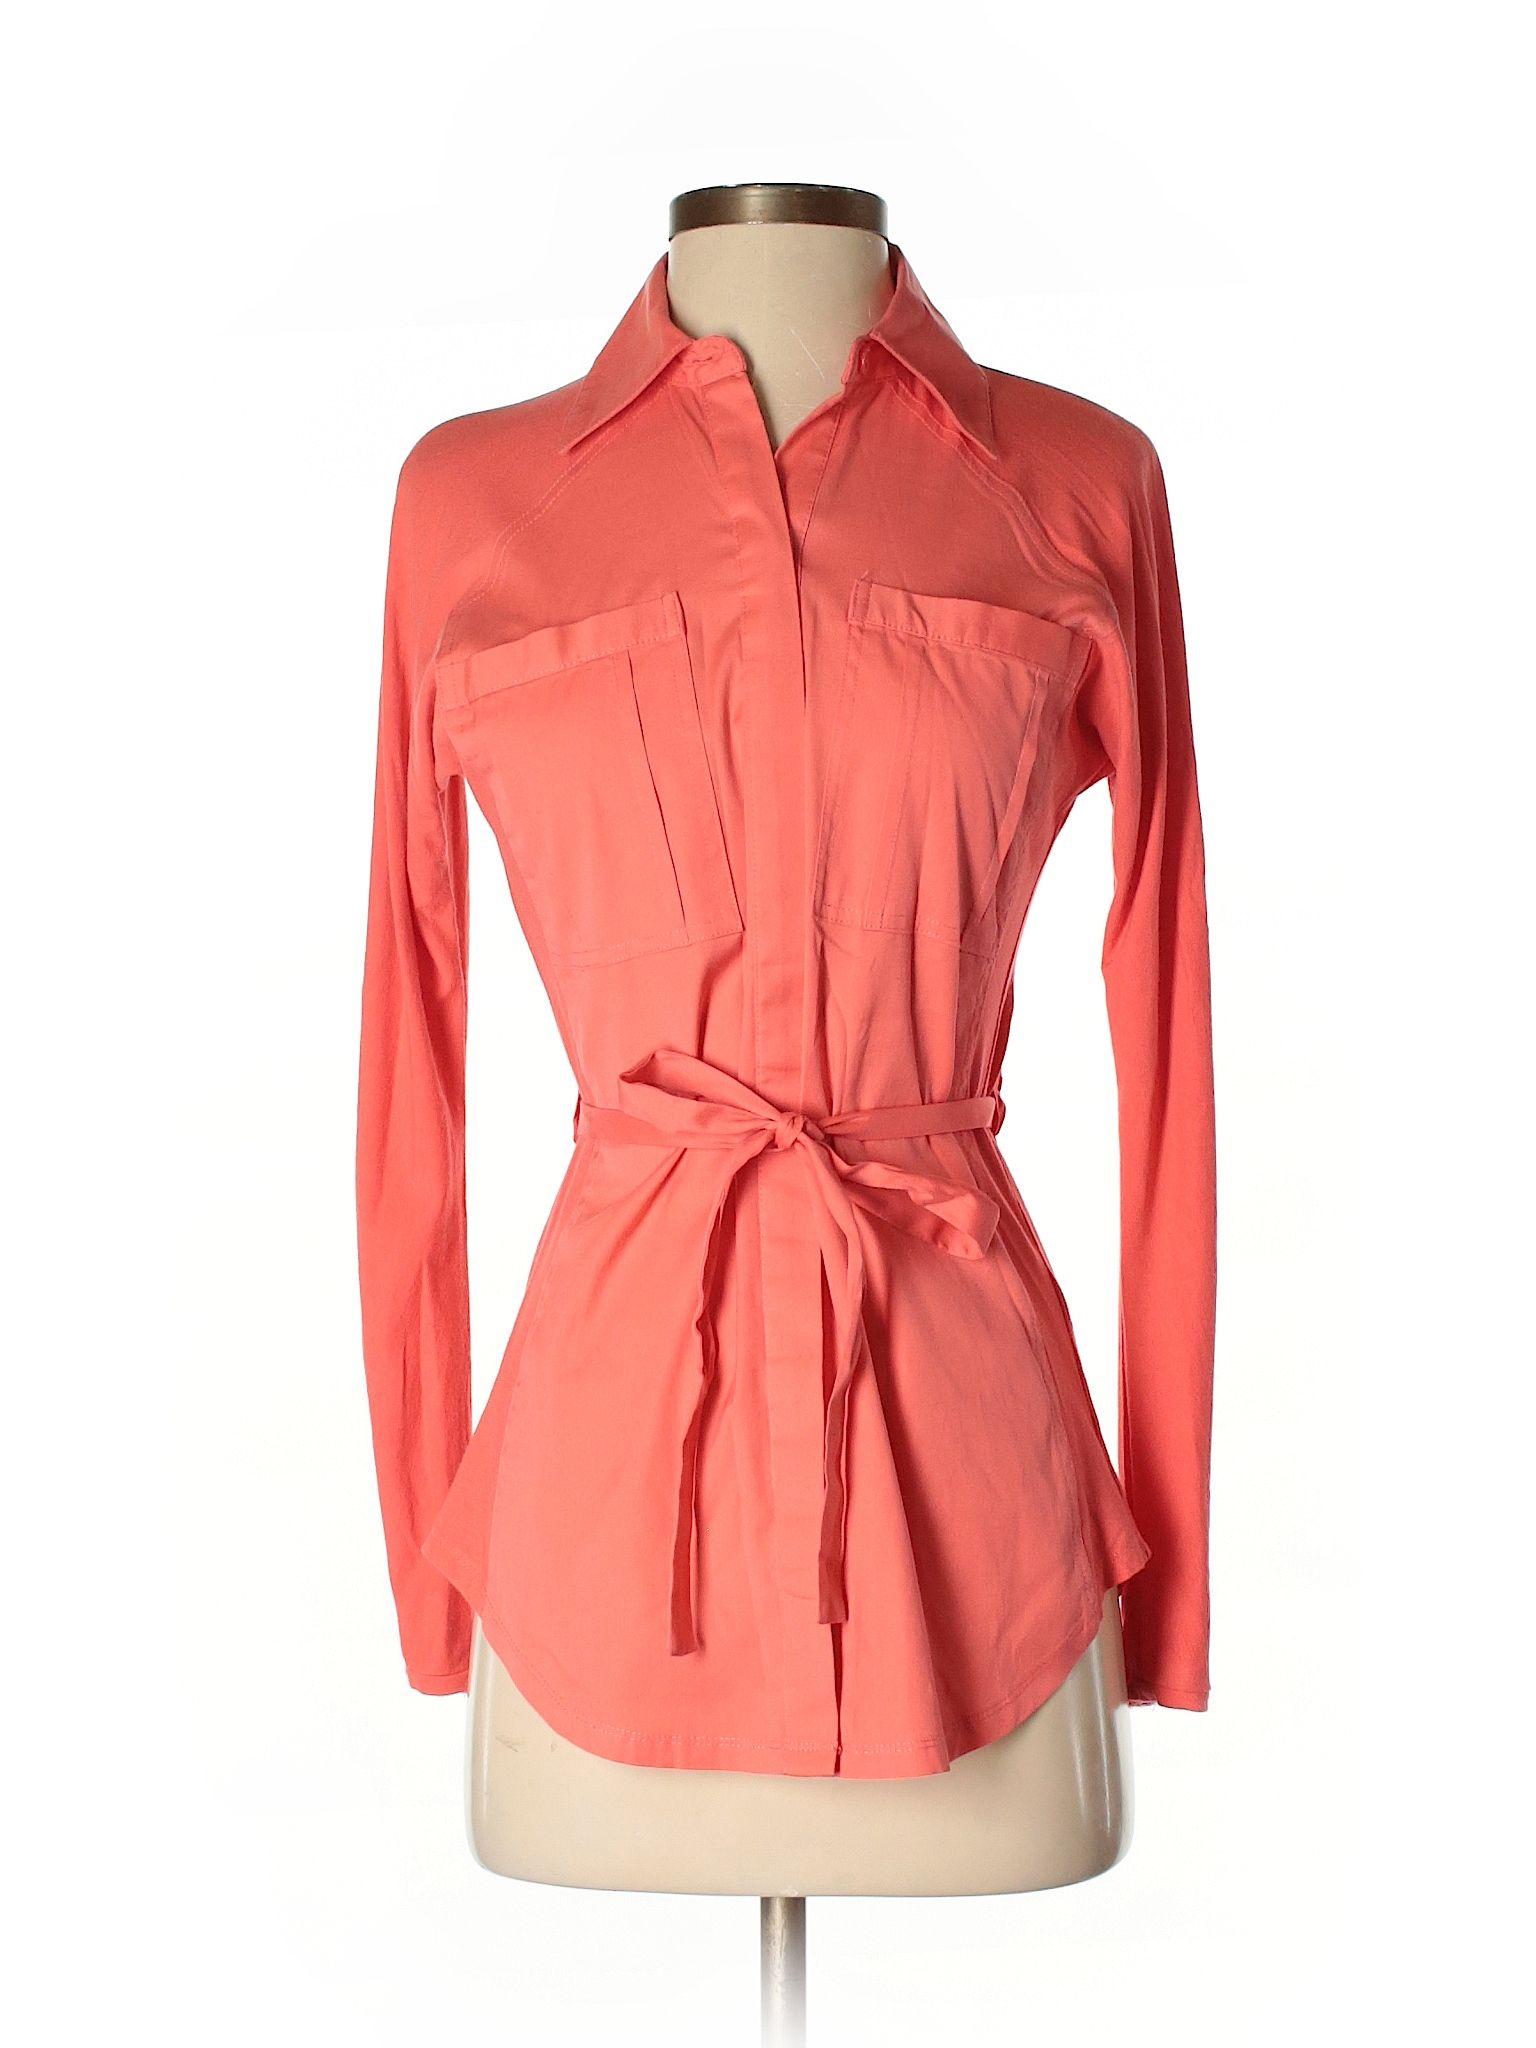 Foxford Long Sleeve Button Down Shirt Size 000 Coral Womens